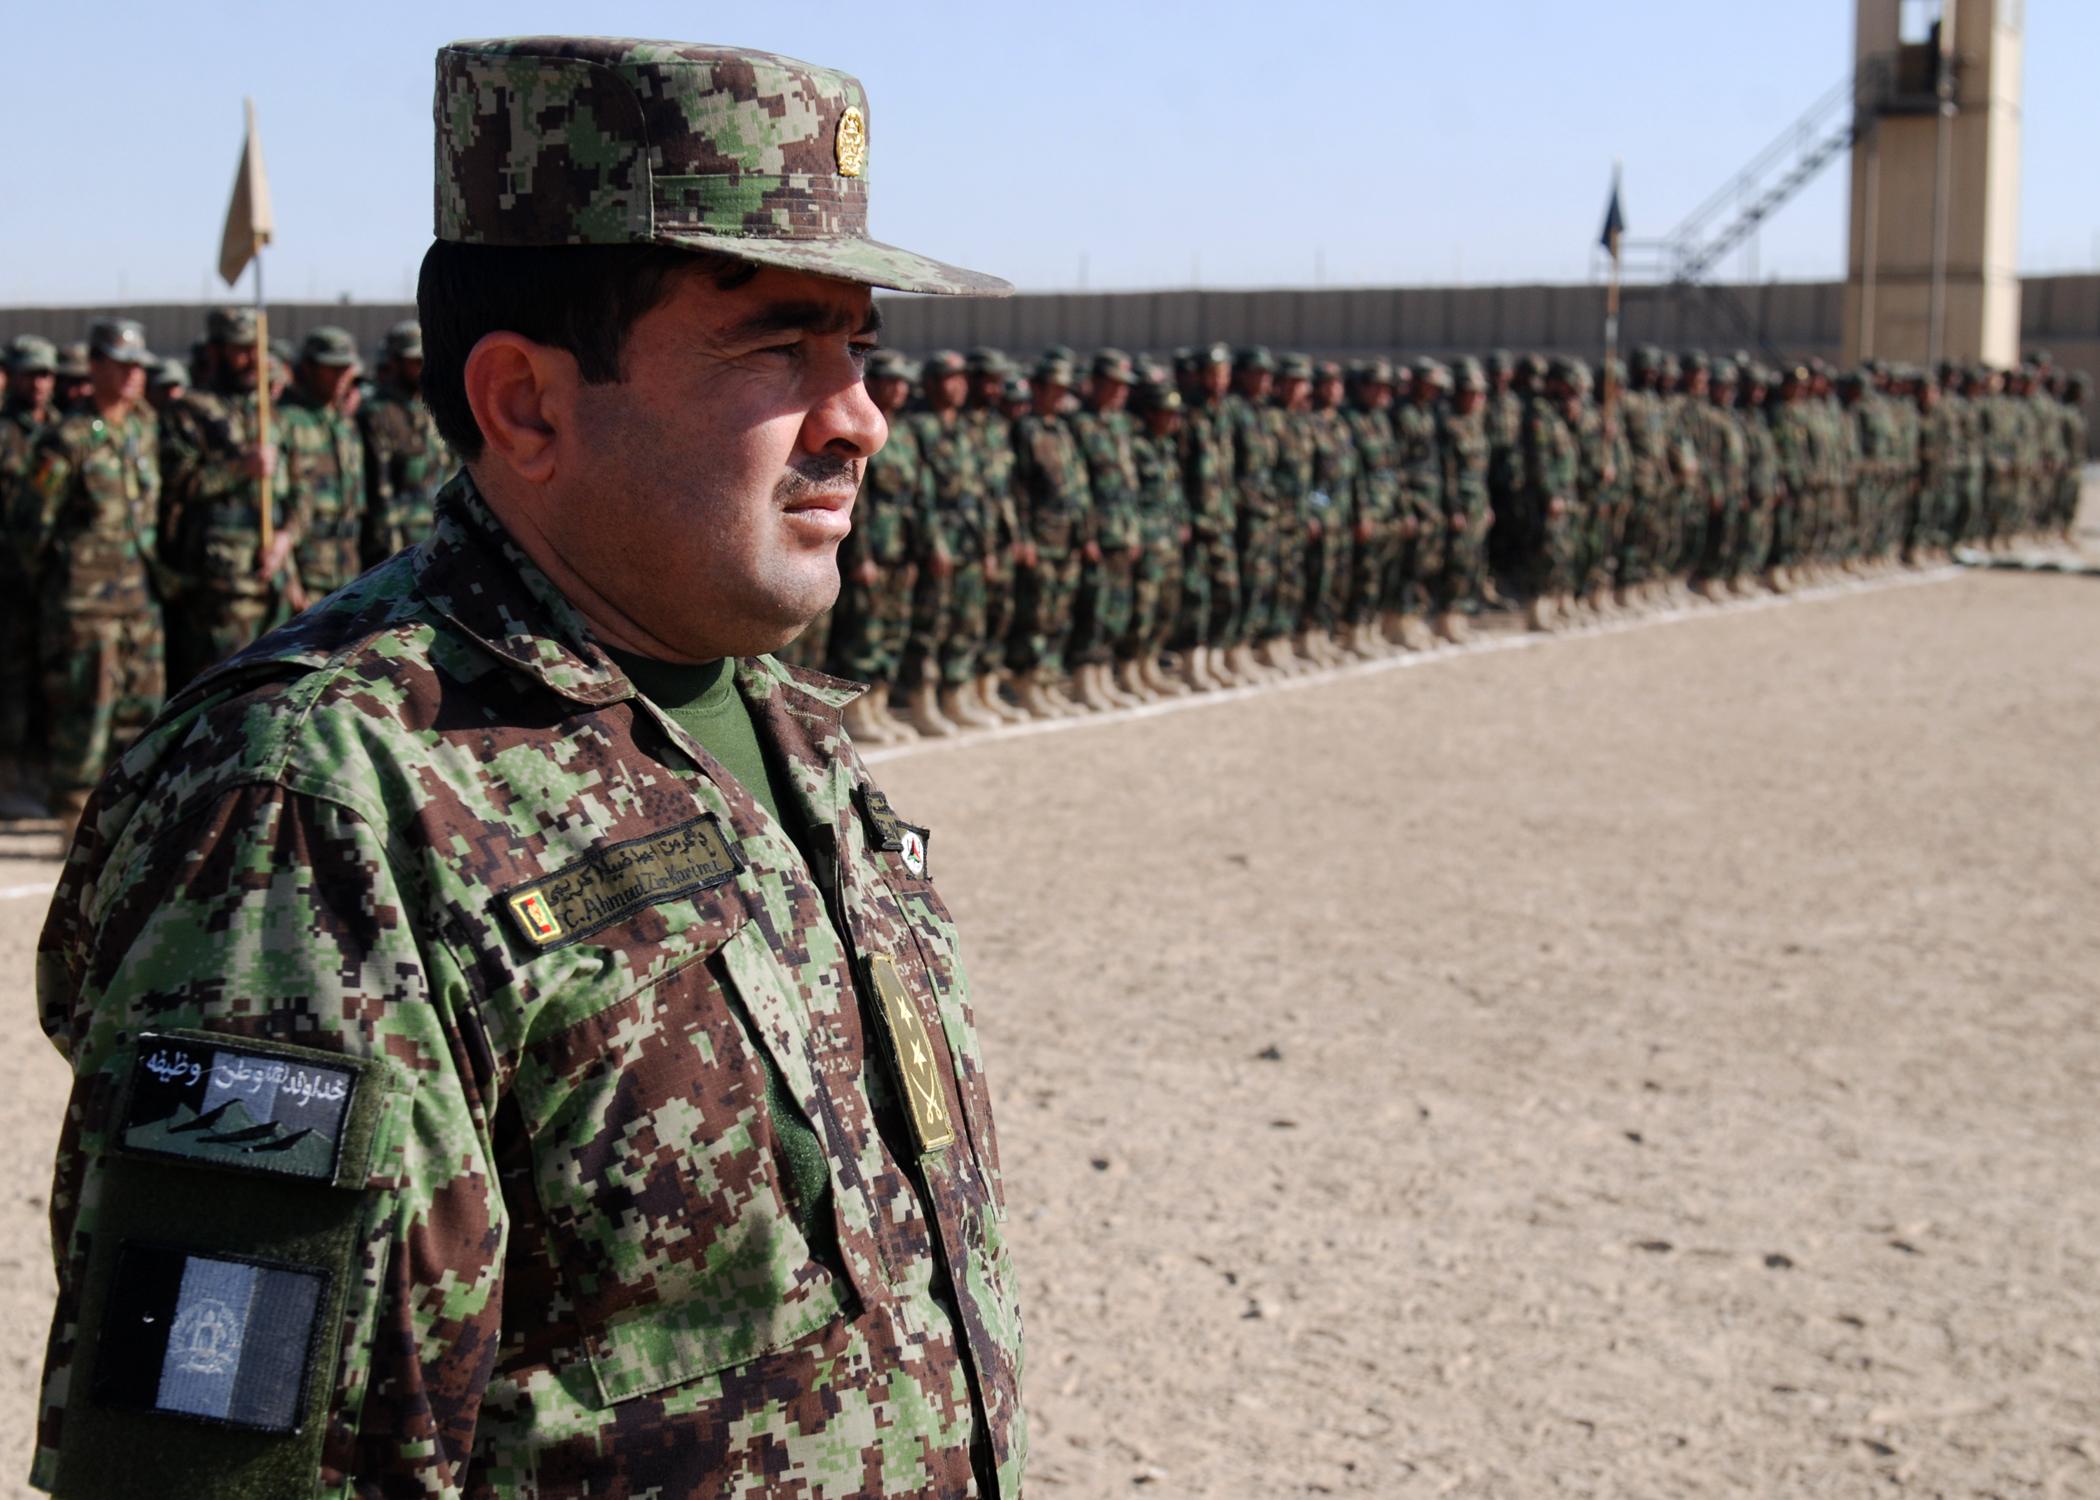 Kandahar dating site